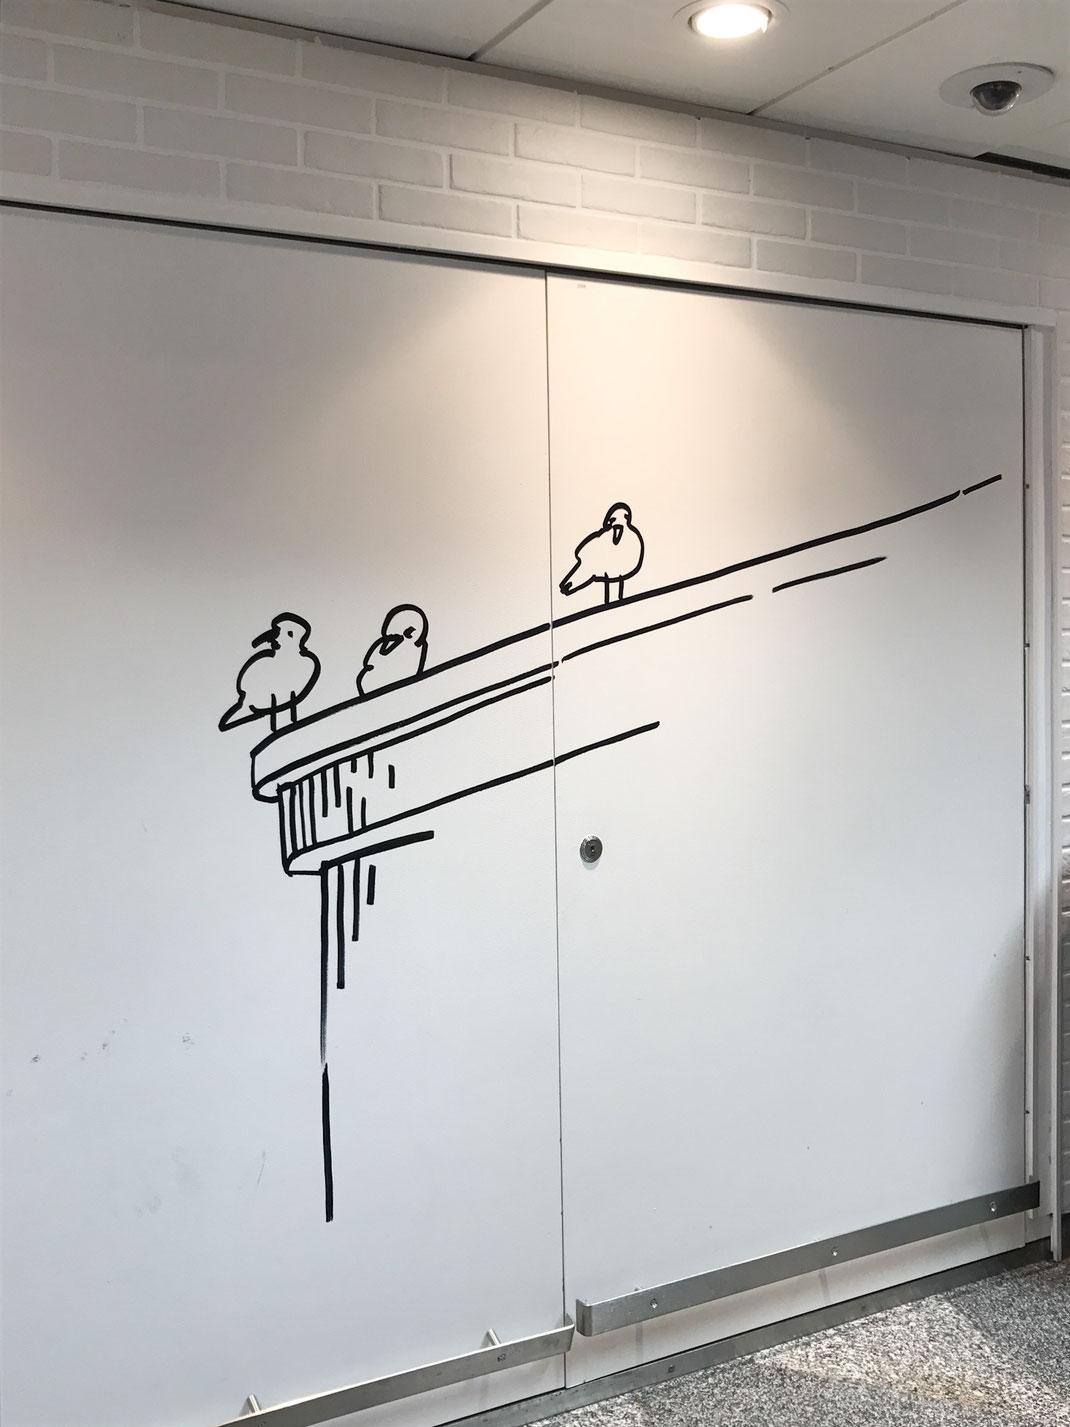 VANTAA空港のお気に入りのカモメ この絵が好きです